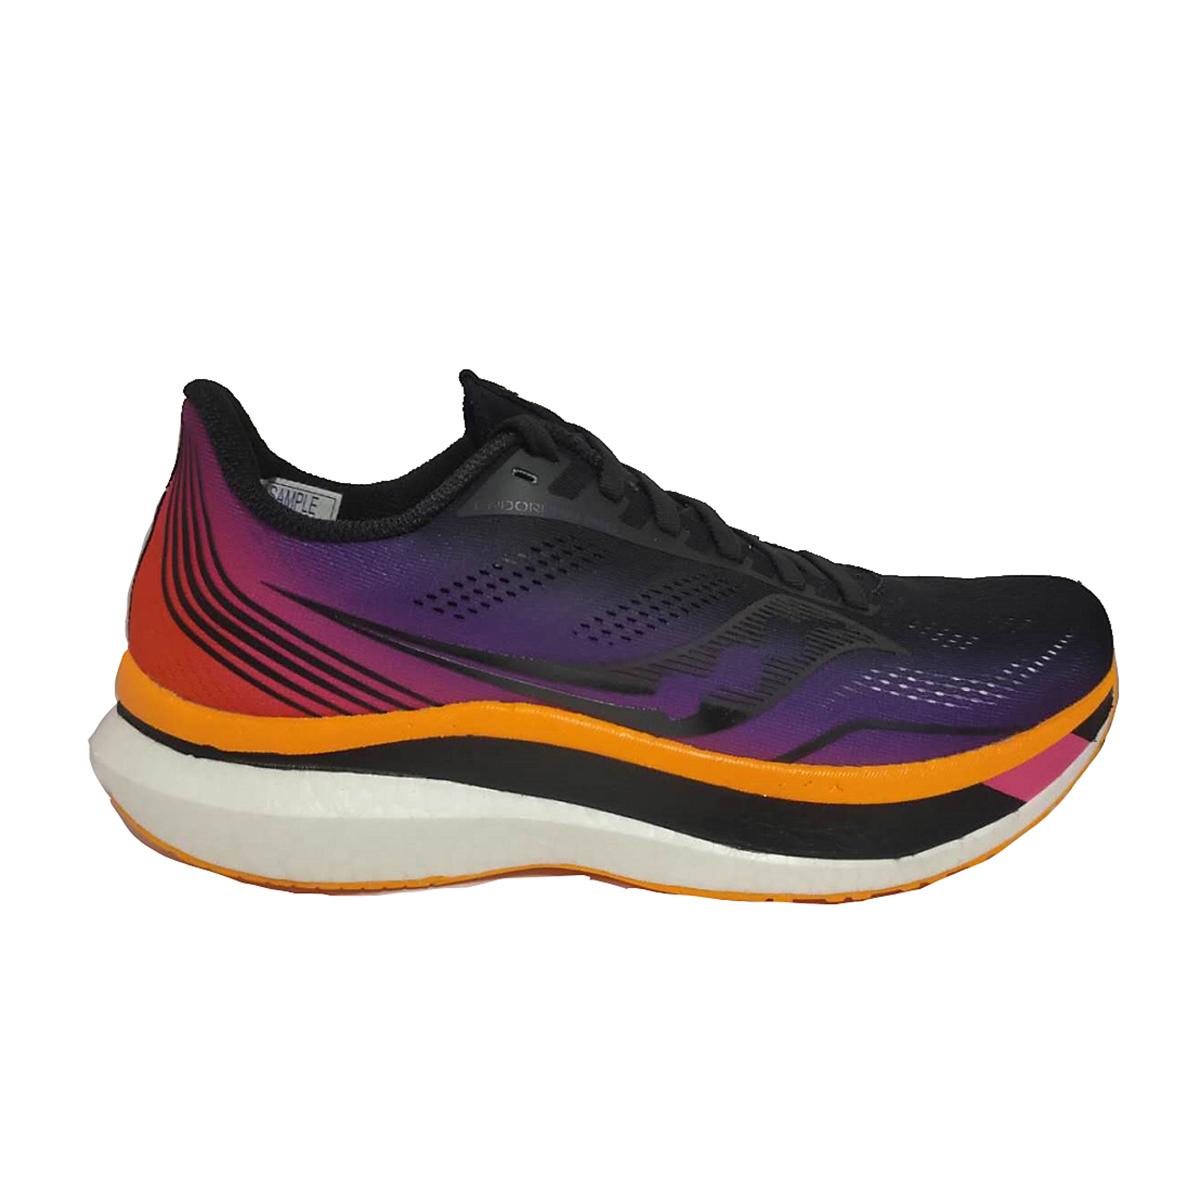 Men's Saucony Endorphin Pro Running Shoe - Color: Sunset - Size: 7 - Width: Regular, Sunset, large, image 1